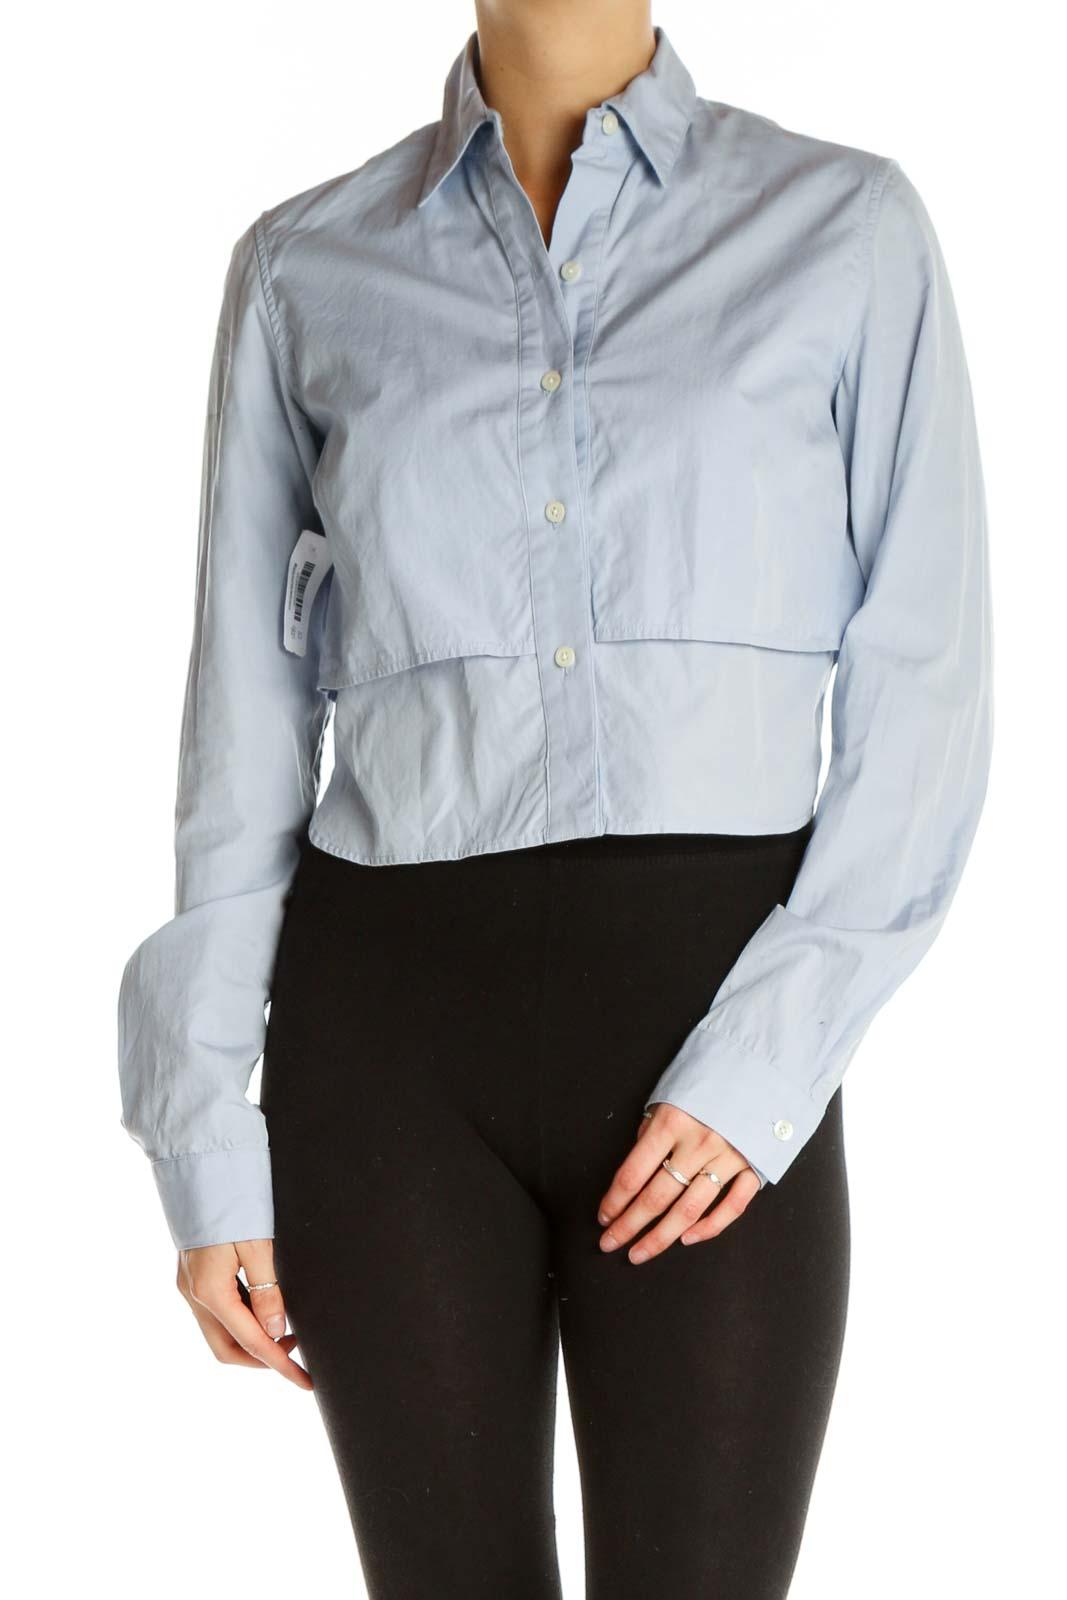 Blue Solid Formal Shirt Front